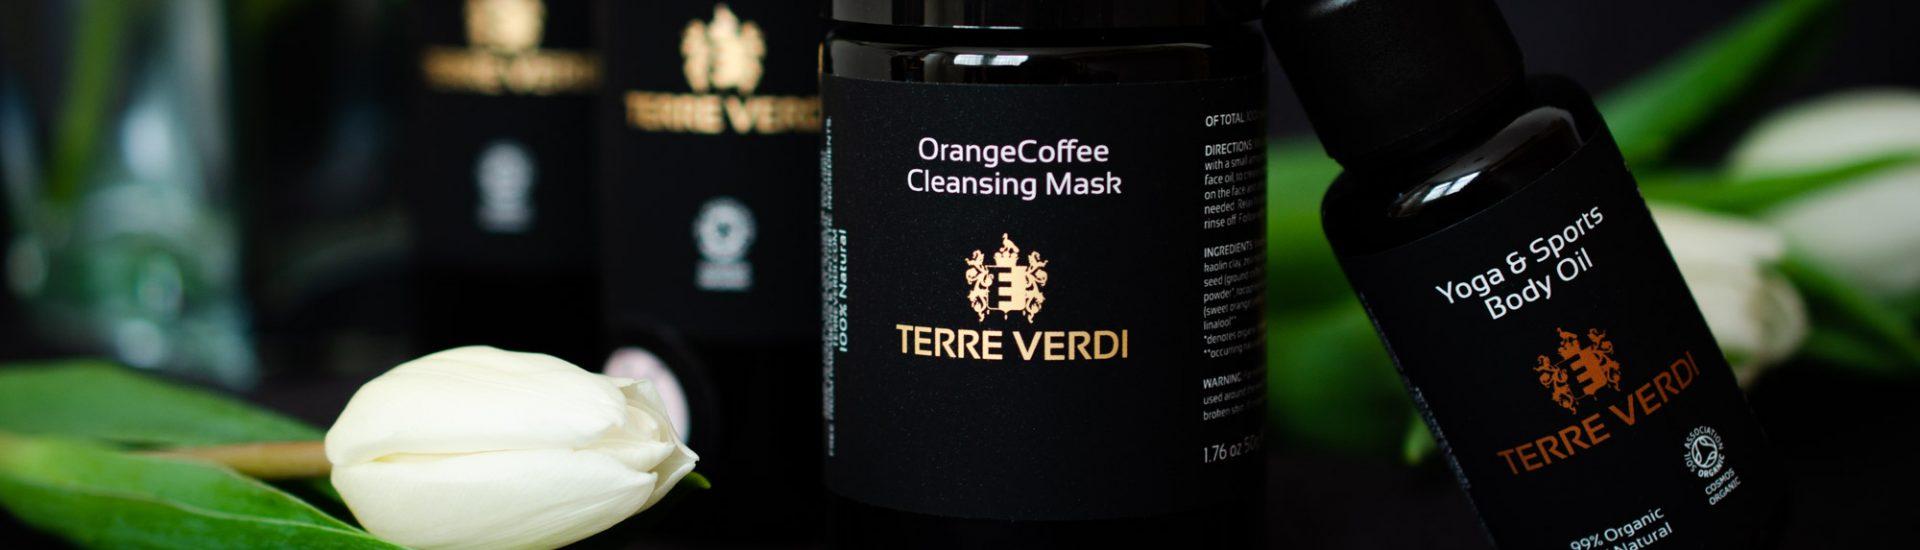 Terre Verdi Orange Coffee Face Mask and more!